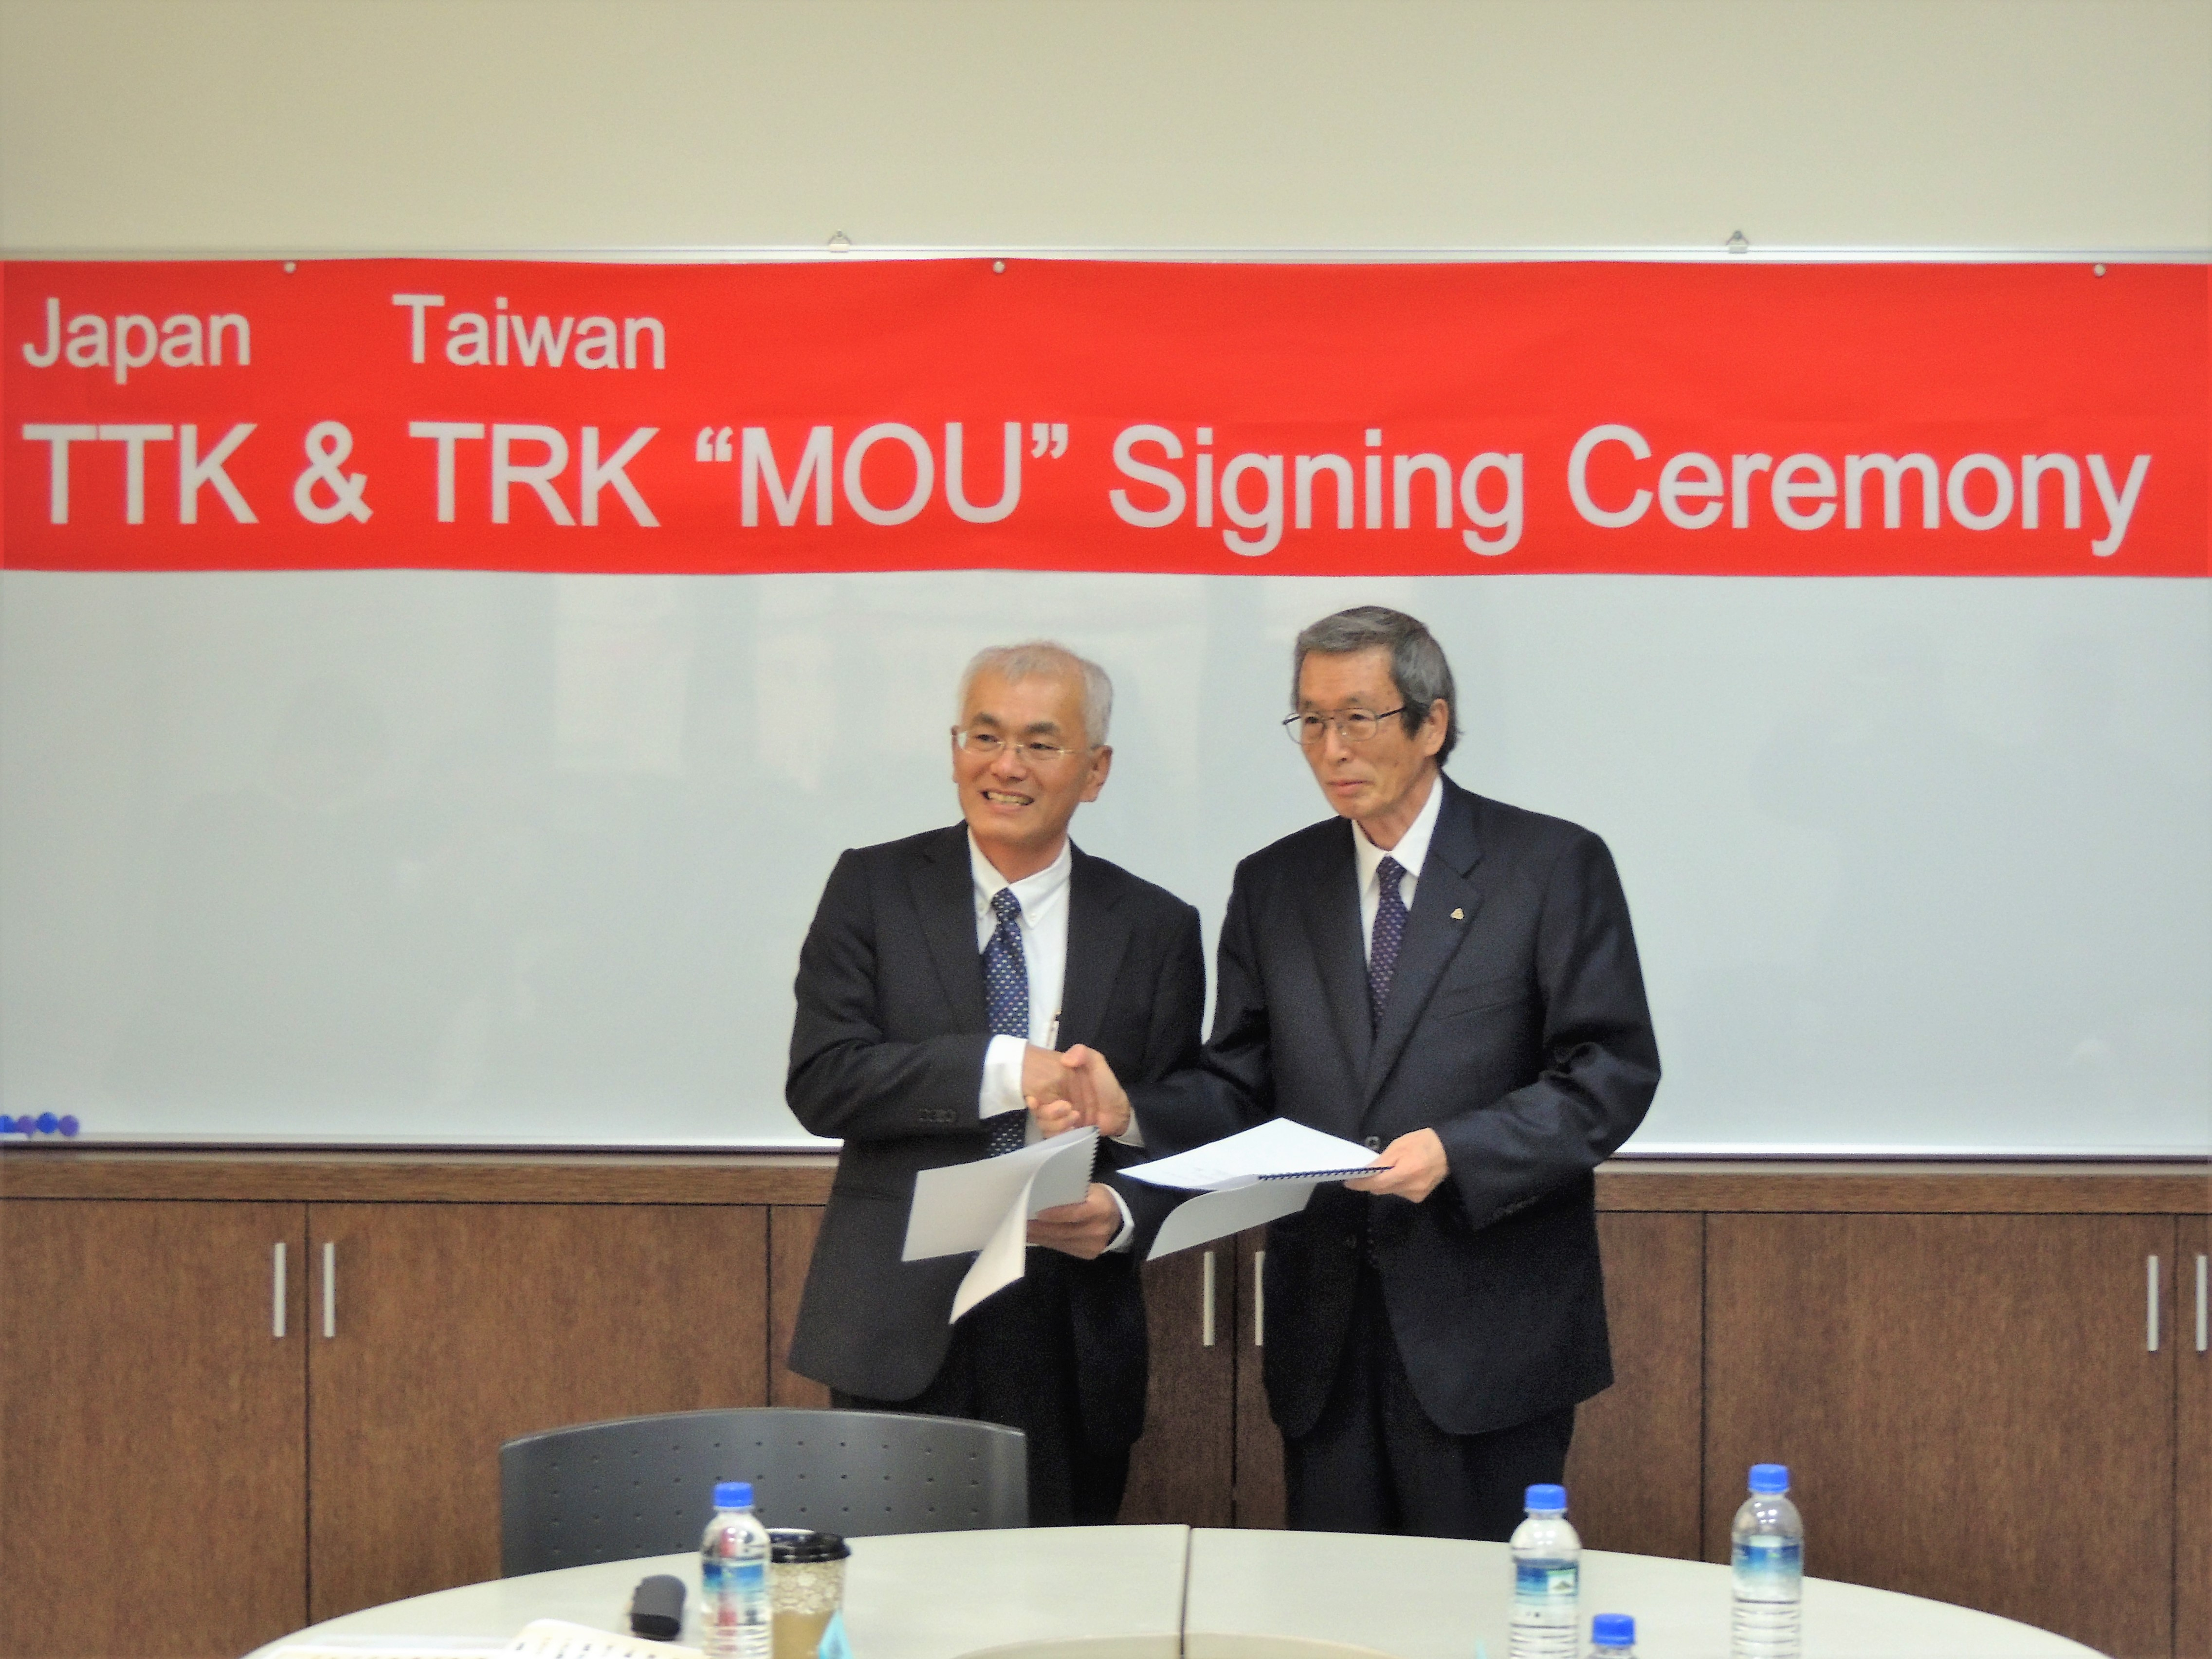 TTK和TRK簽訂MOU合作備忘錄